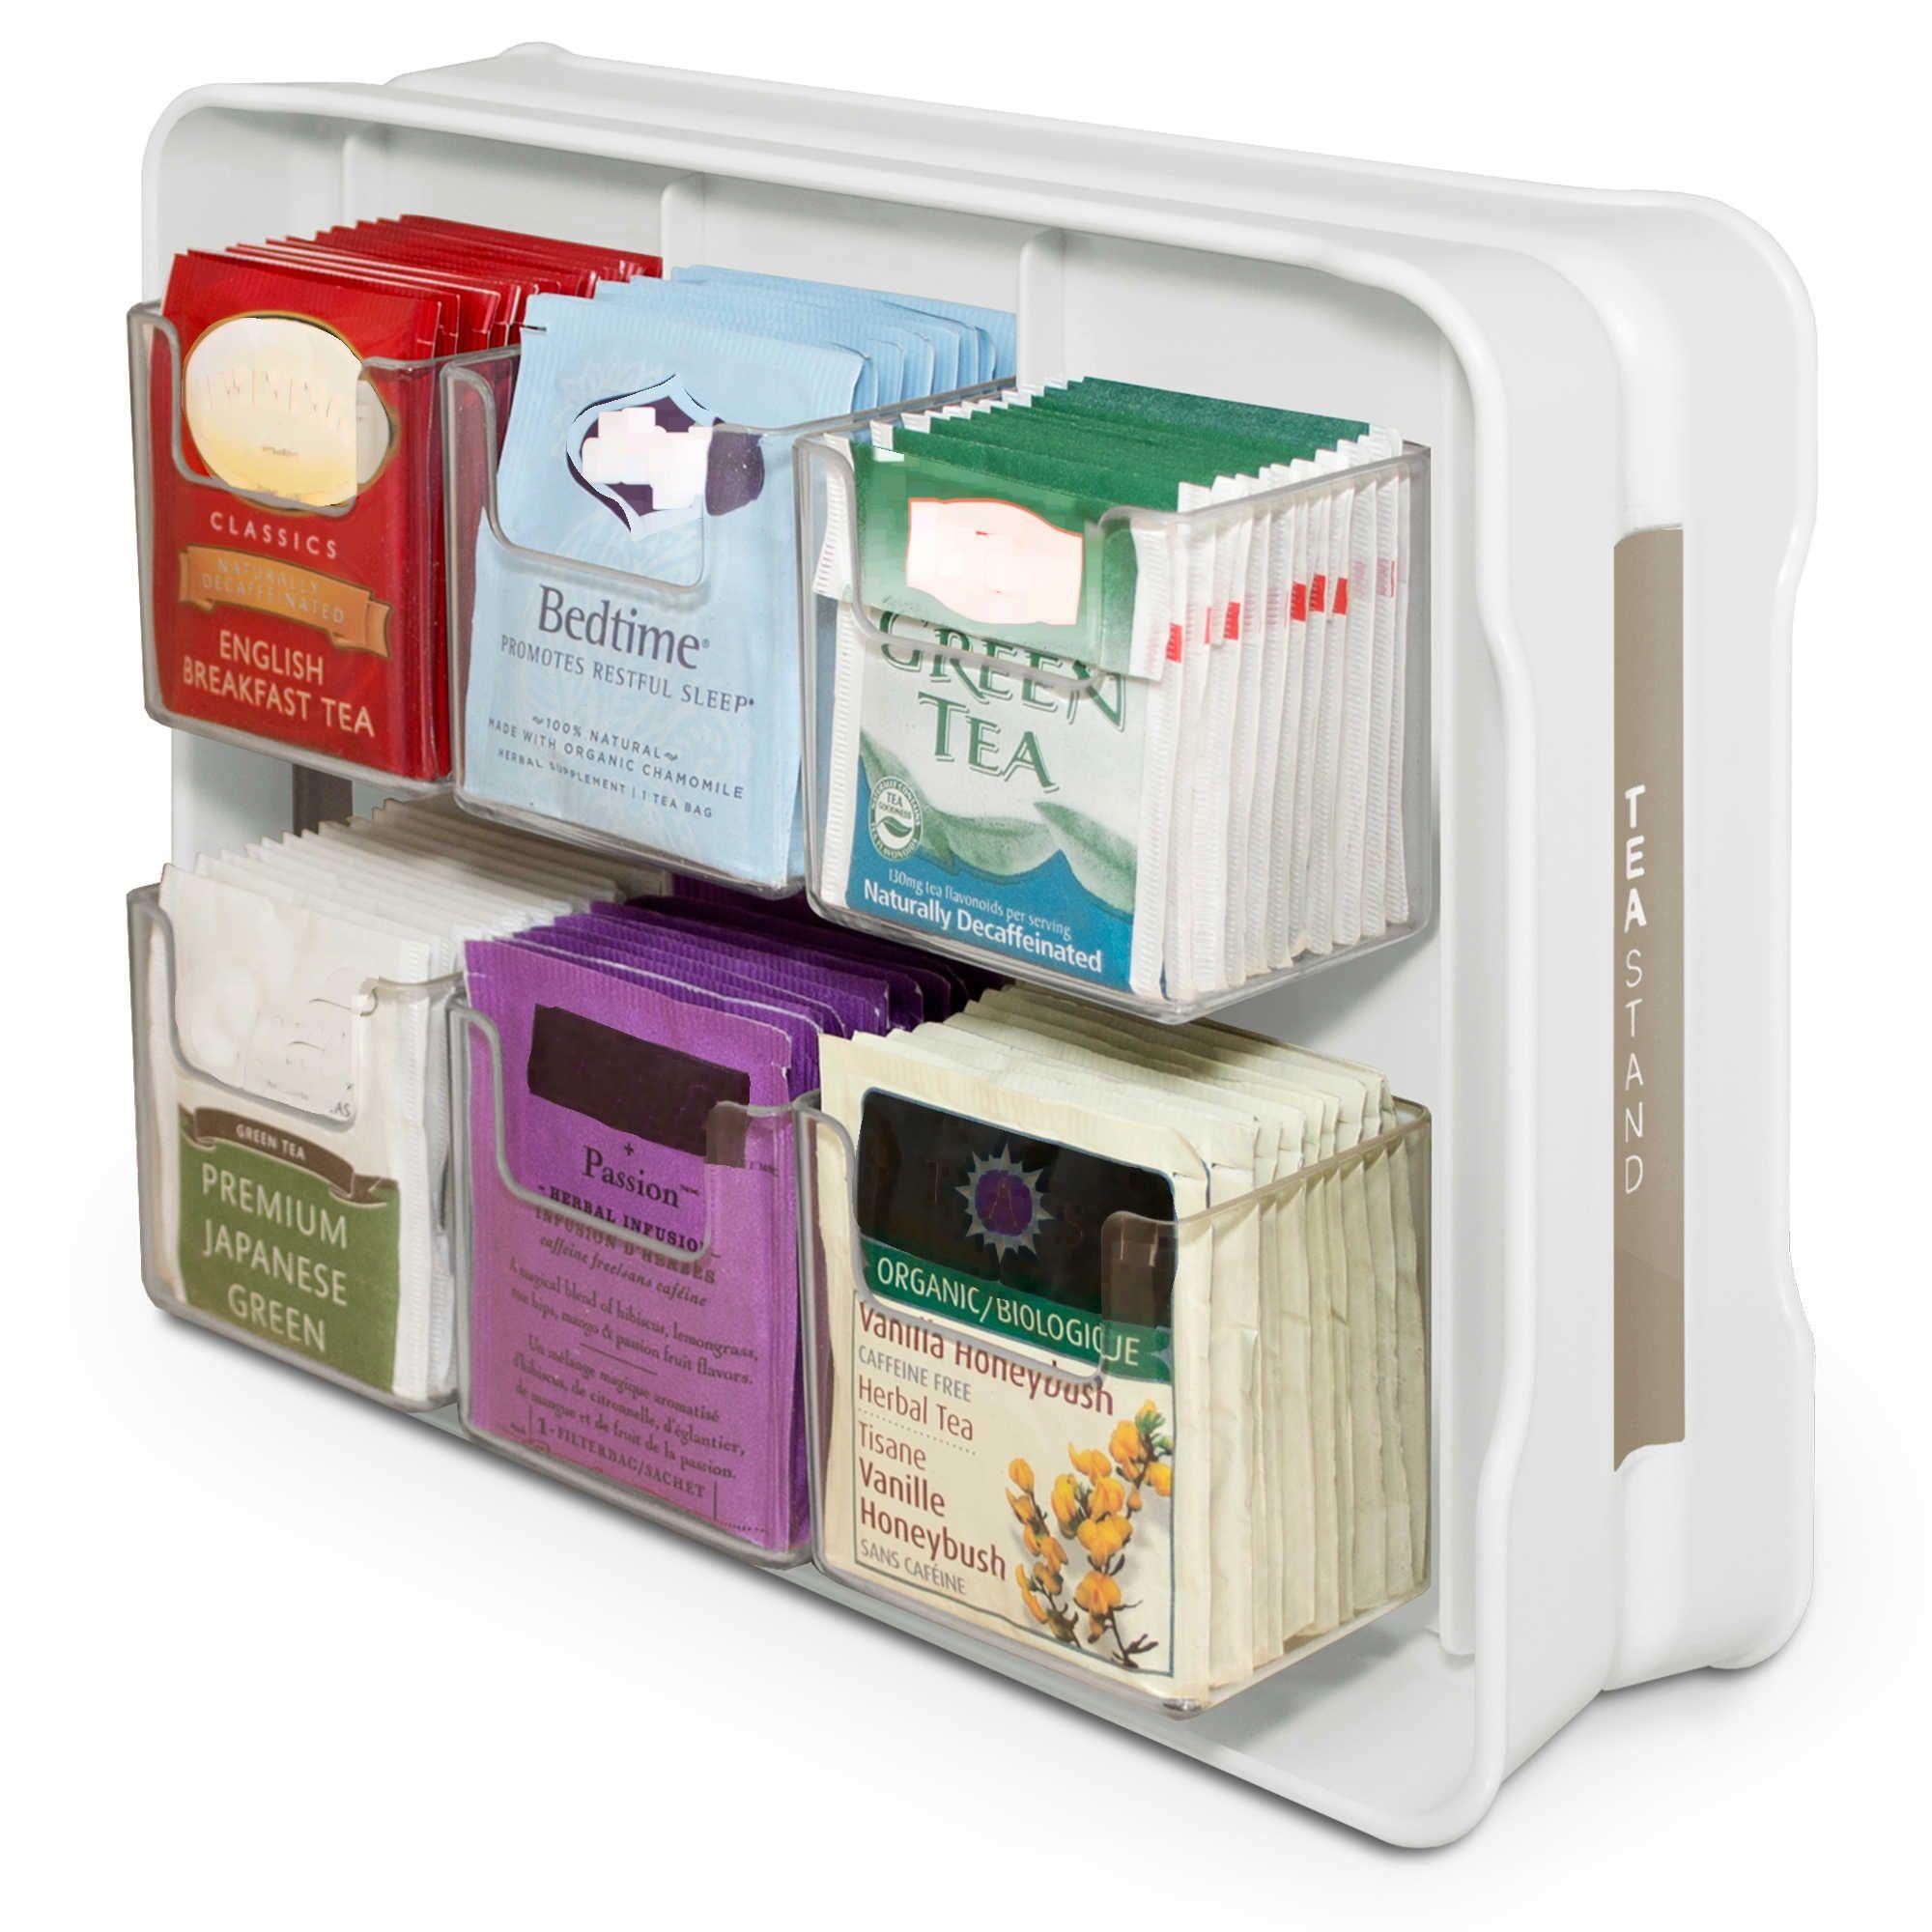 YouCopia® TeaStand® Tea Bag Organizer and Caddy